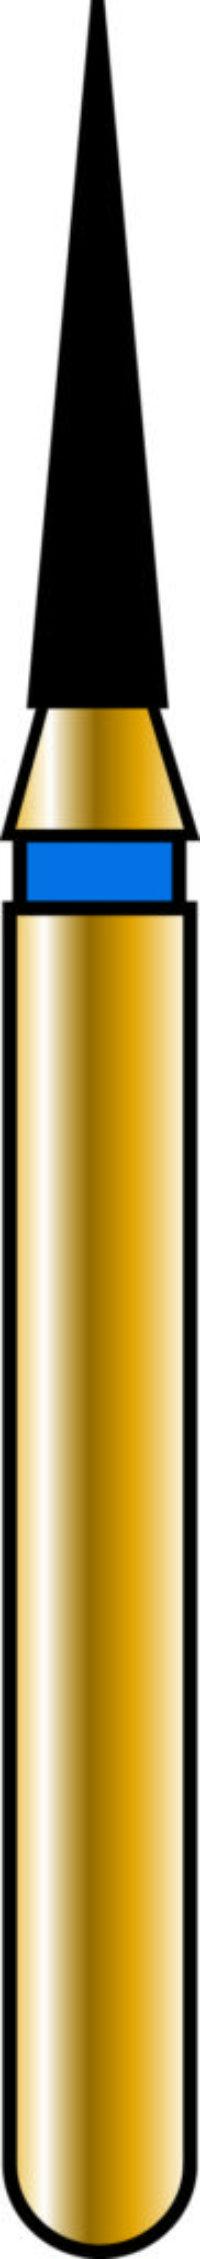 Flame 12-6mm Gold Diamond Bur